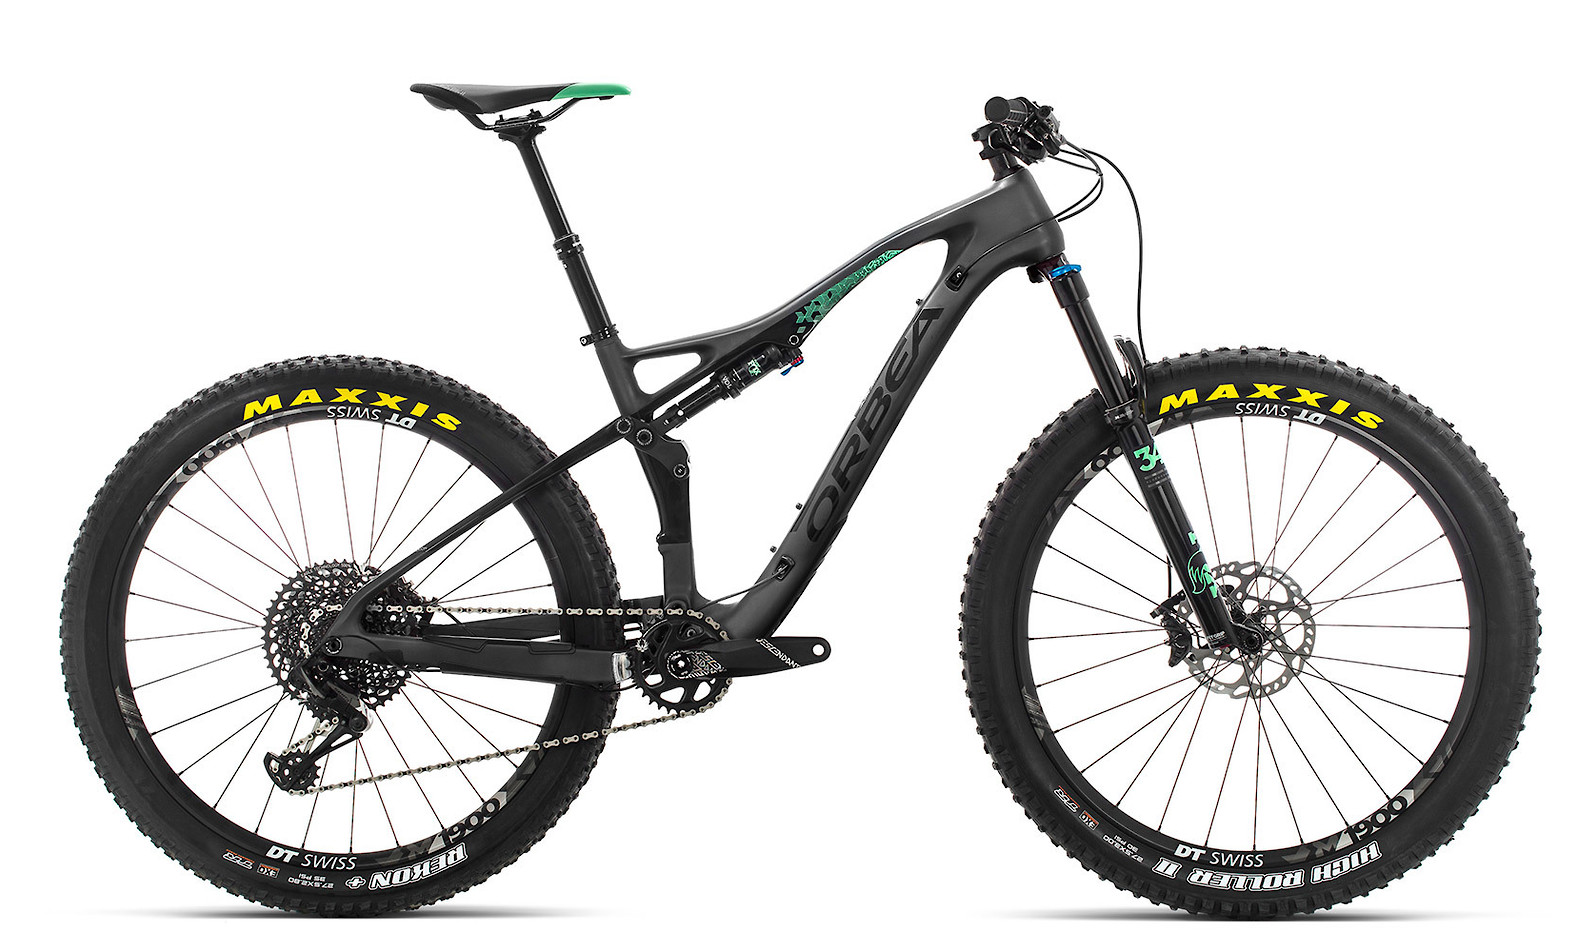 2019 Orbea Occam TR M20 Plus Bike